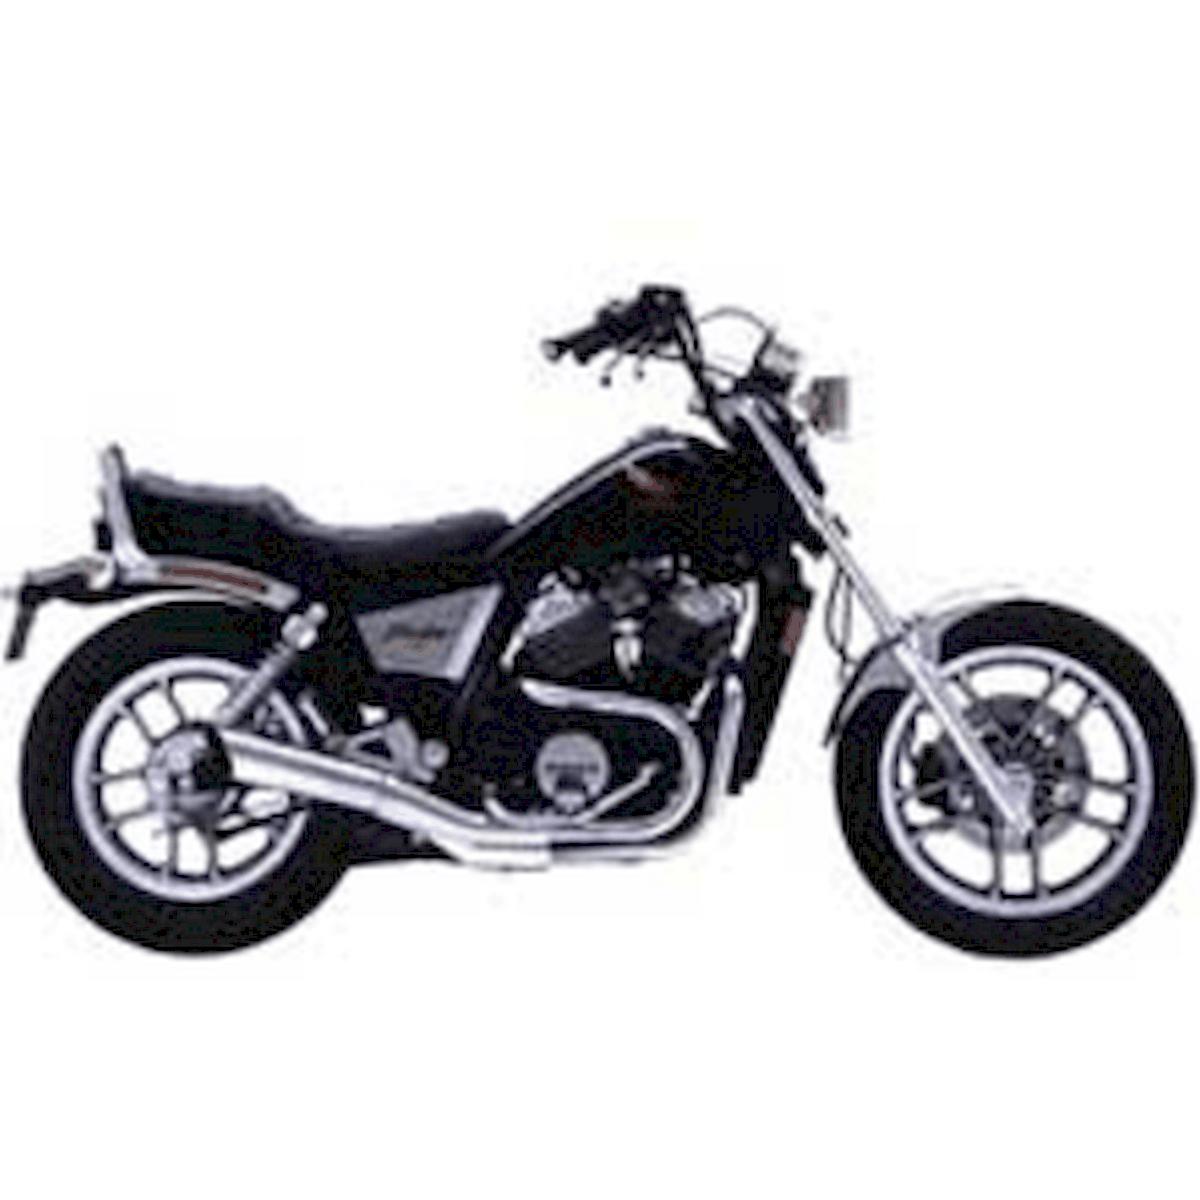 Image of HONDA VT 500 C